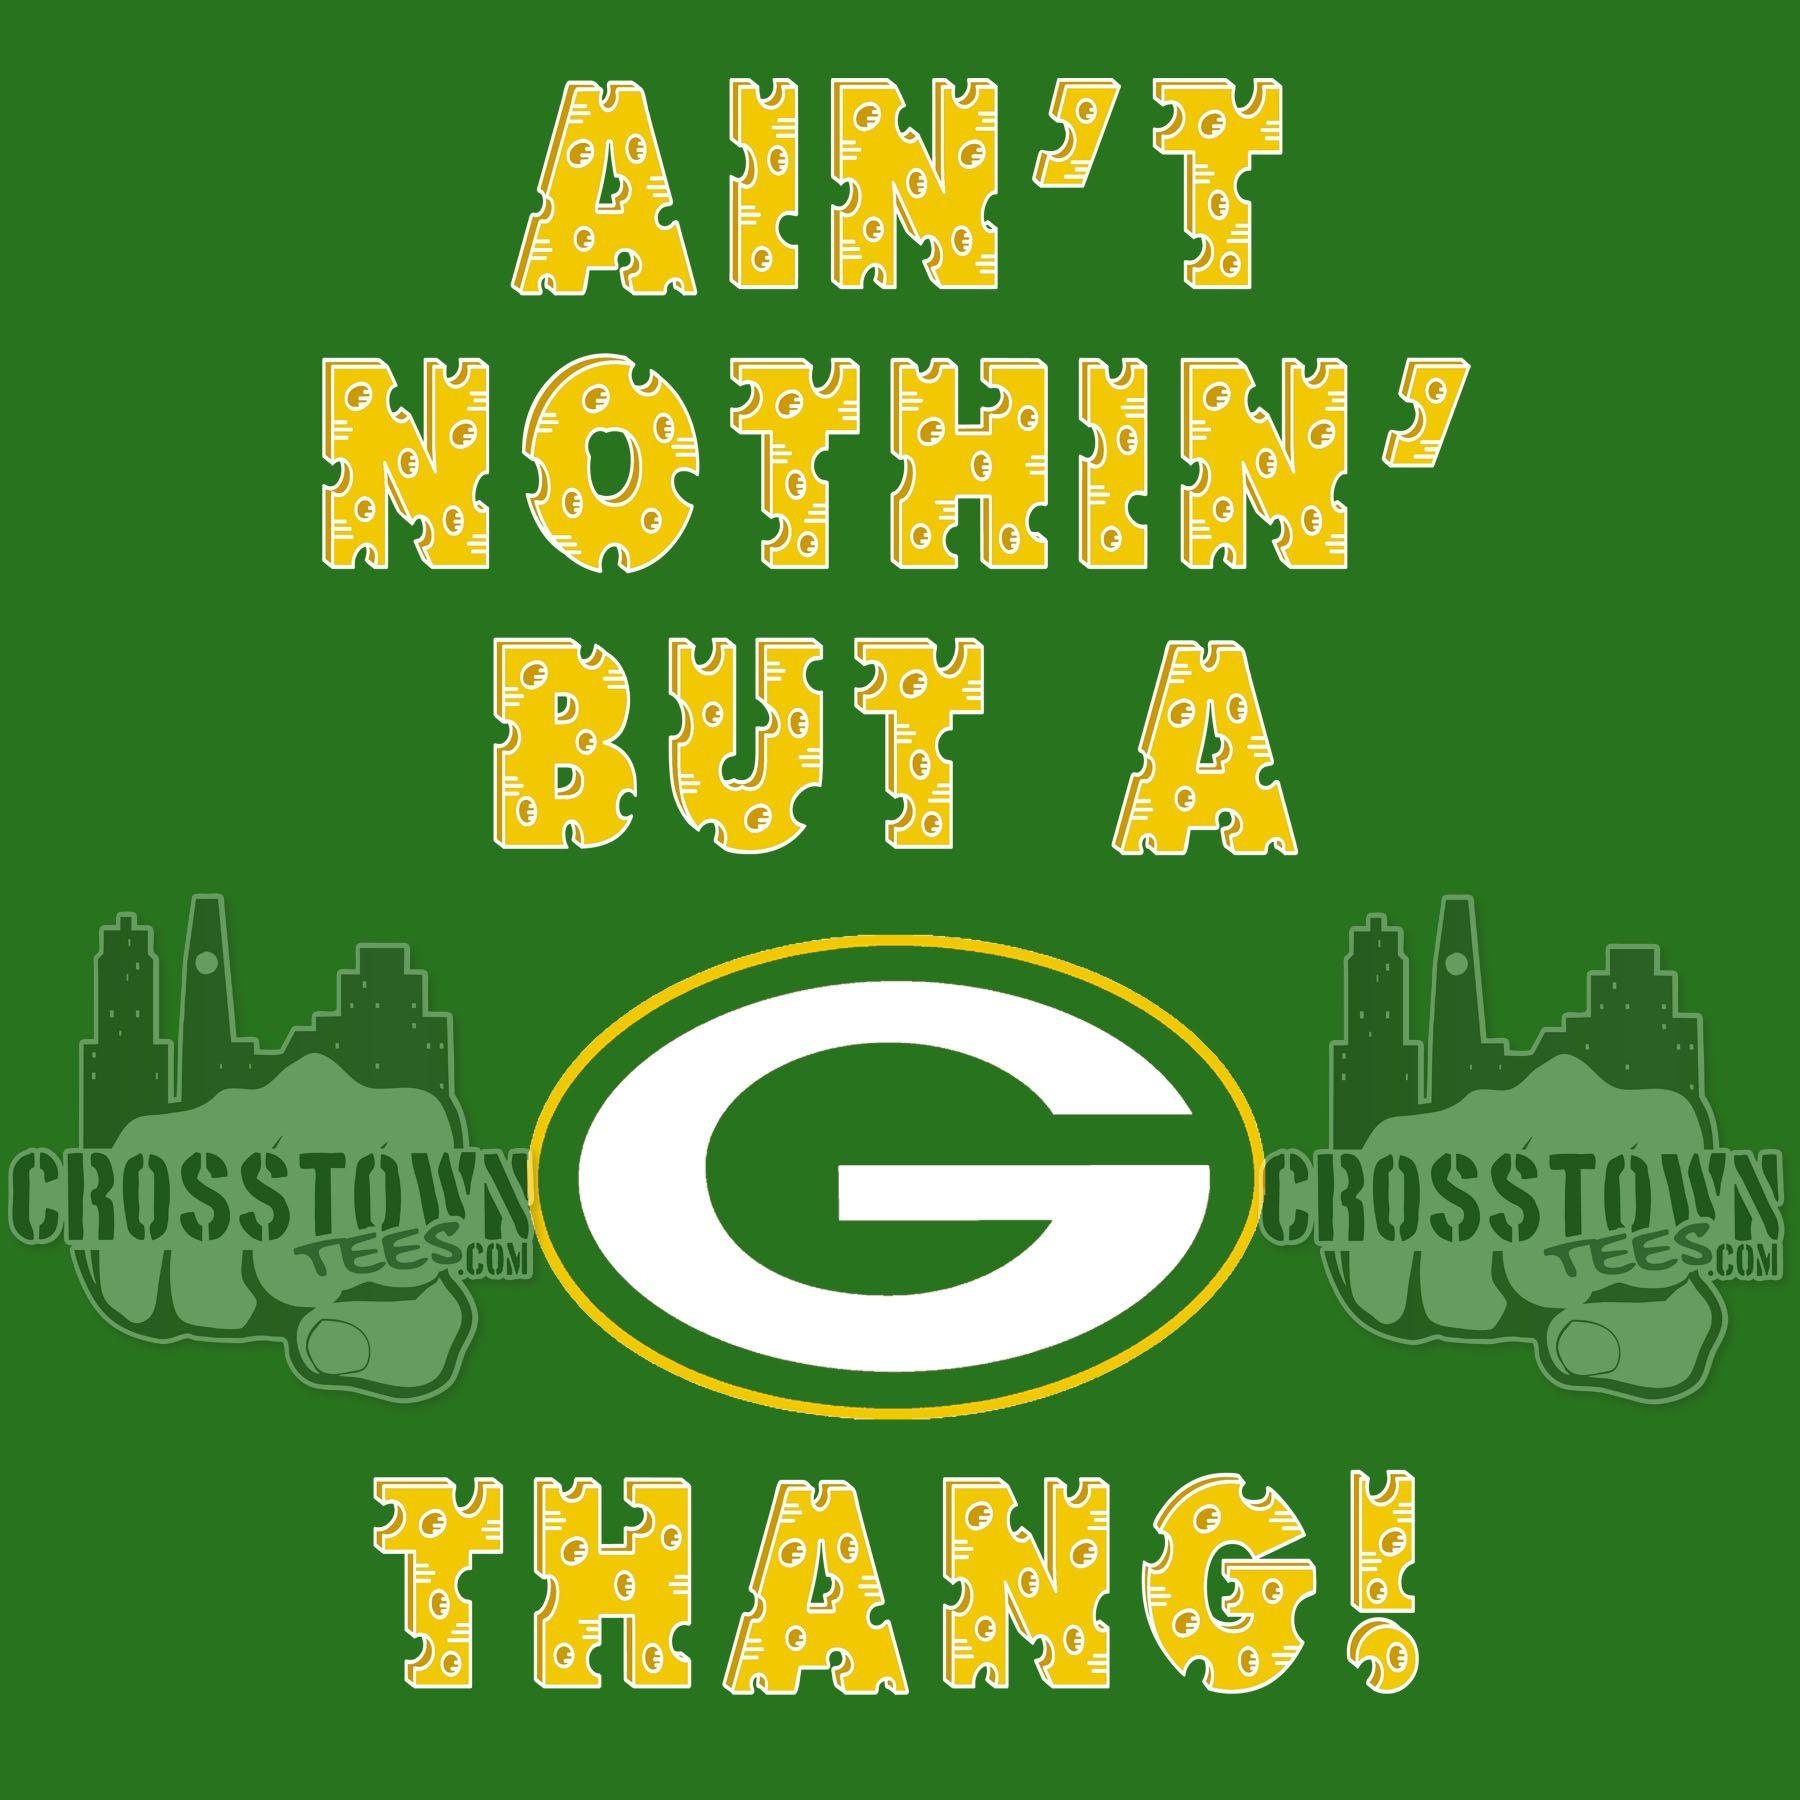 Green Bay G Thang Zoom Jpg 1800 1800 Green Bay Packers Green Bay Packers Fan